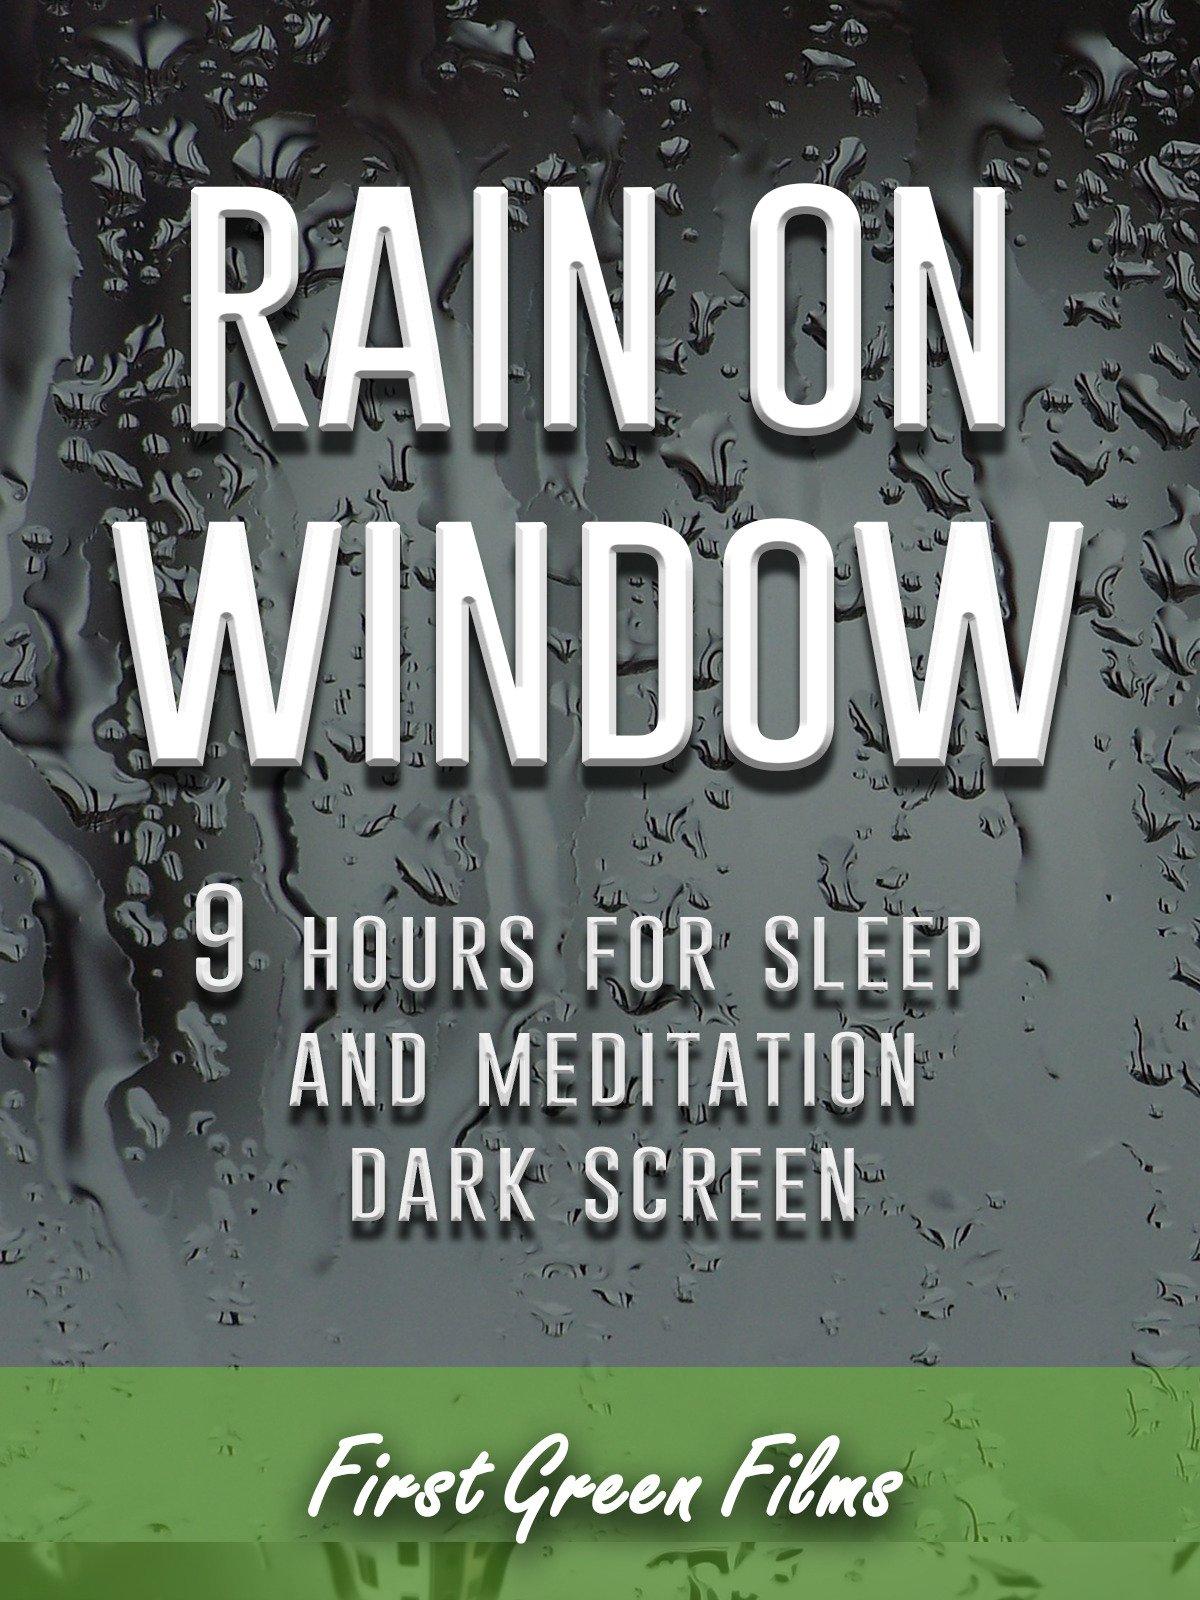 Rain on window, 9 hours for Sleep and Meditation, dark screen